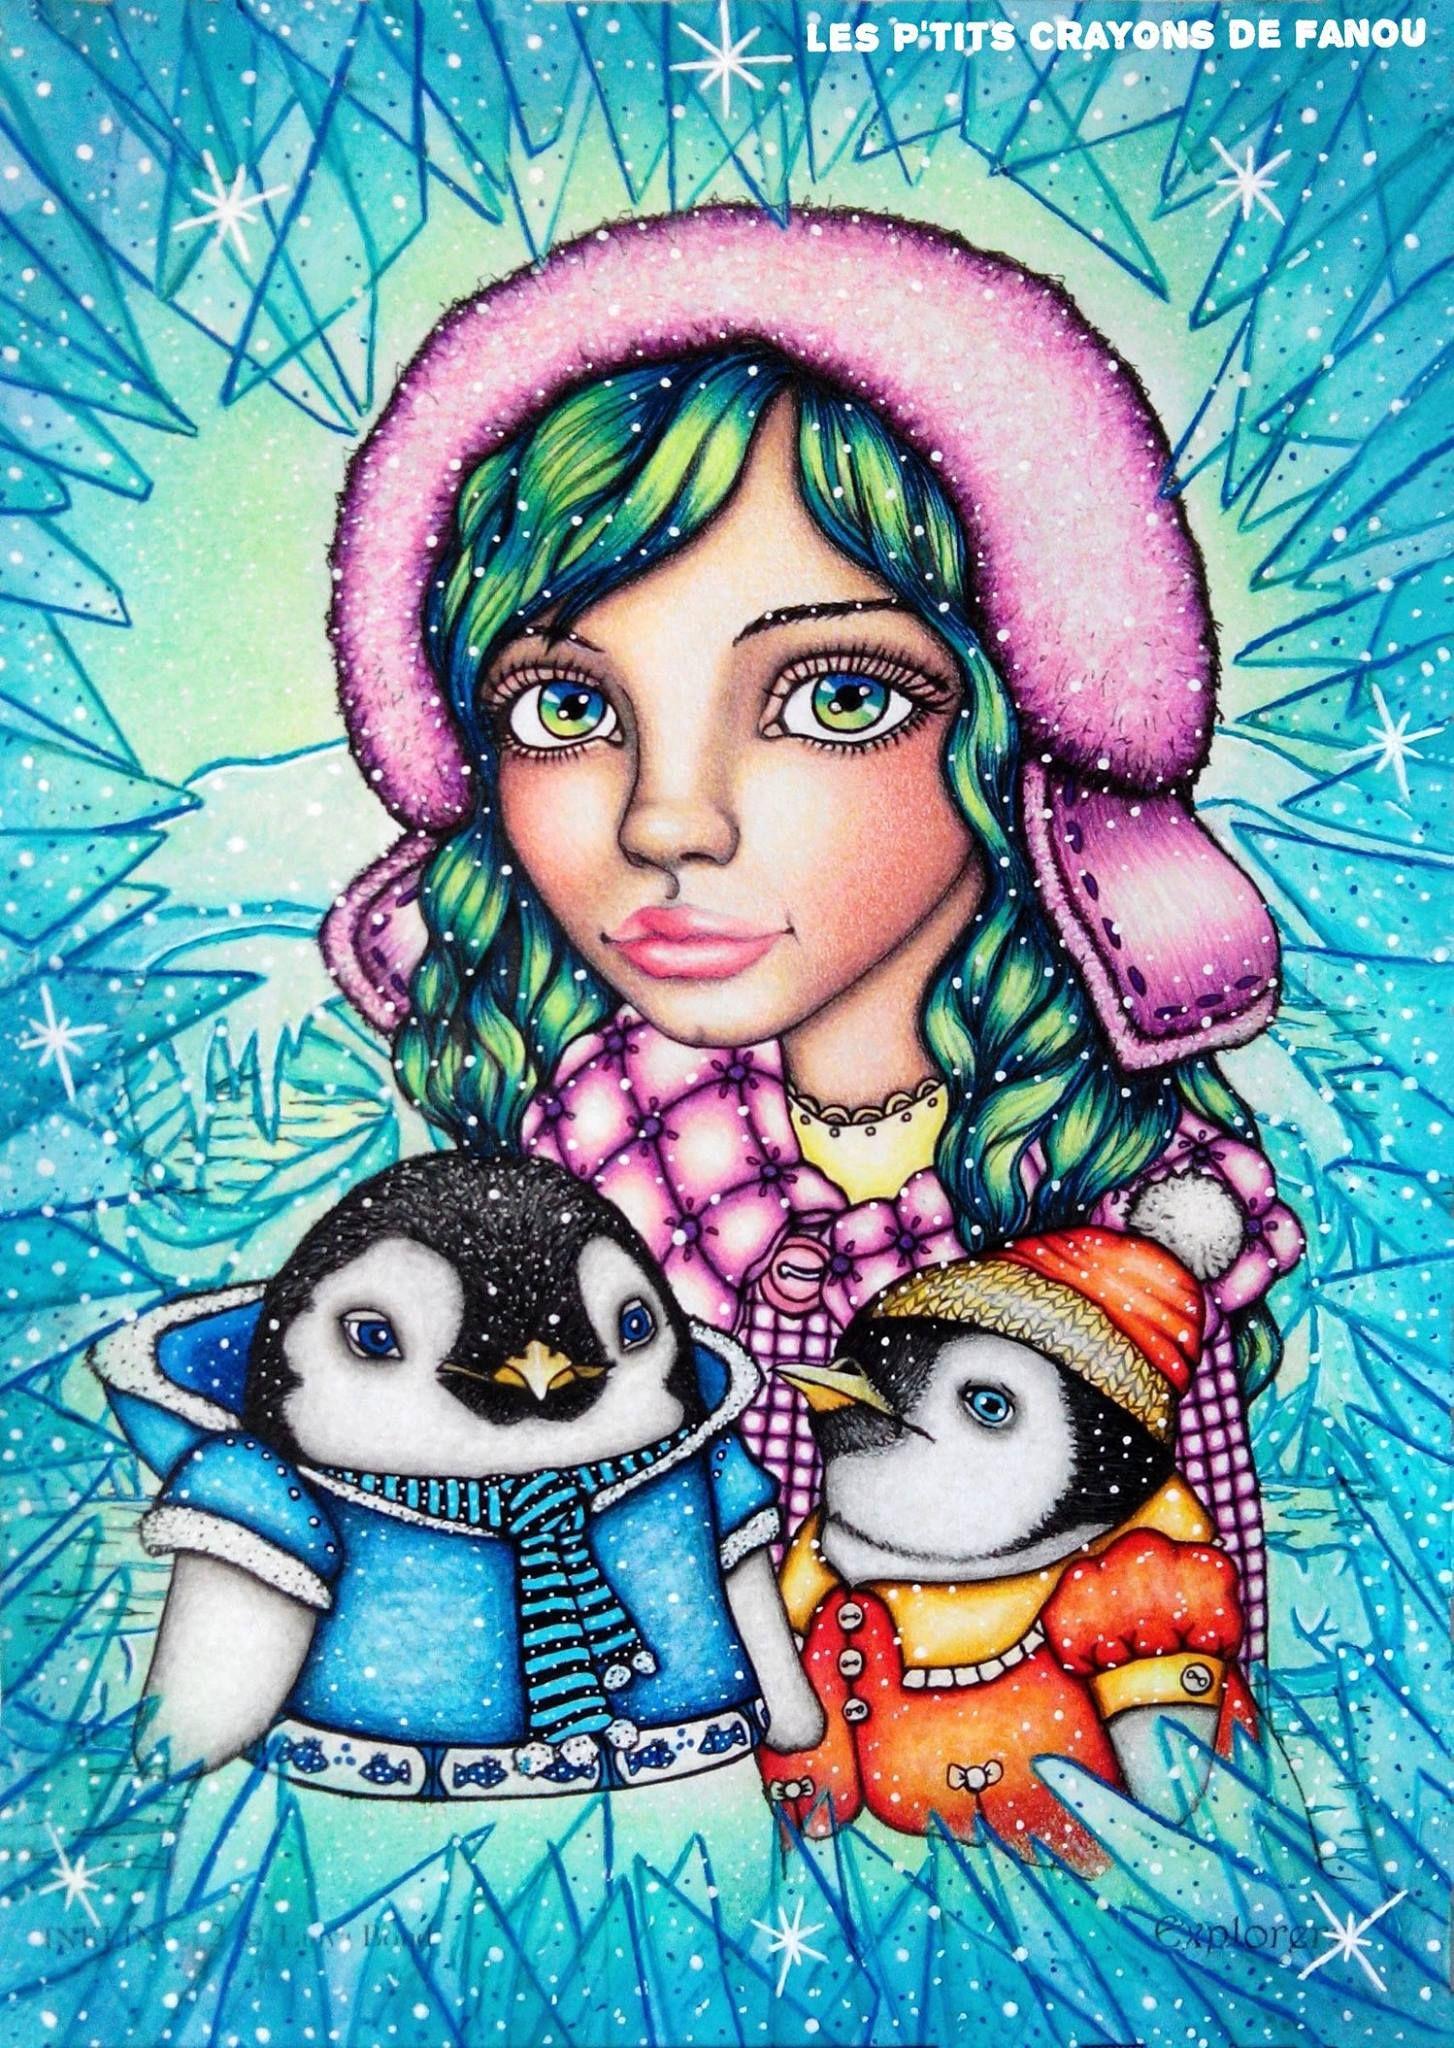 Coloriage Adulte Tuto.Coloriage Adulte Tutoriel Coloring Fun Coloring Books Coloring